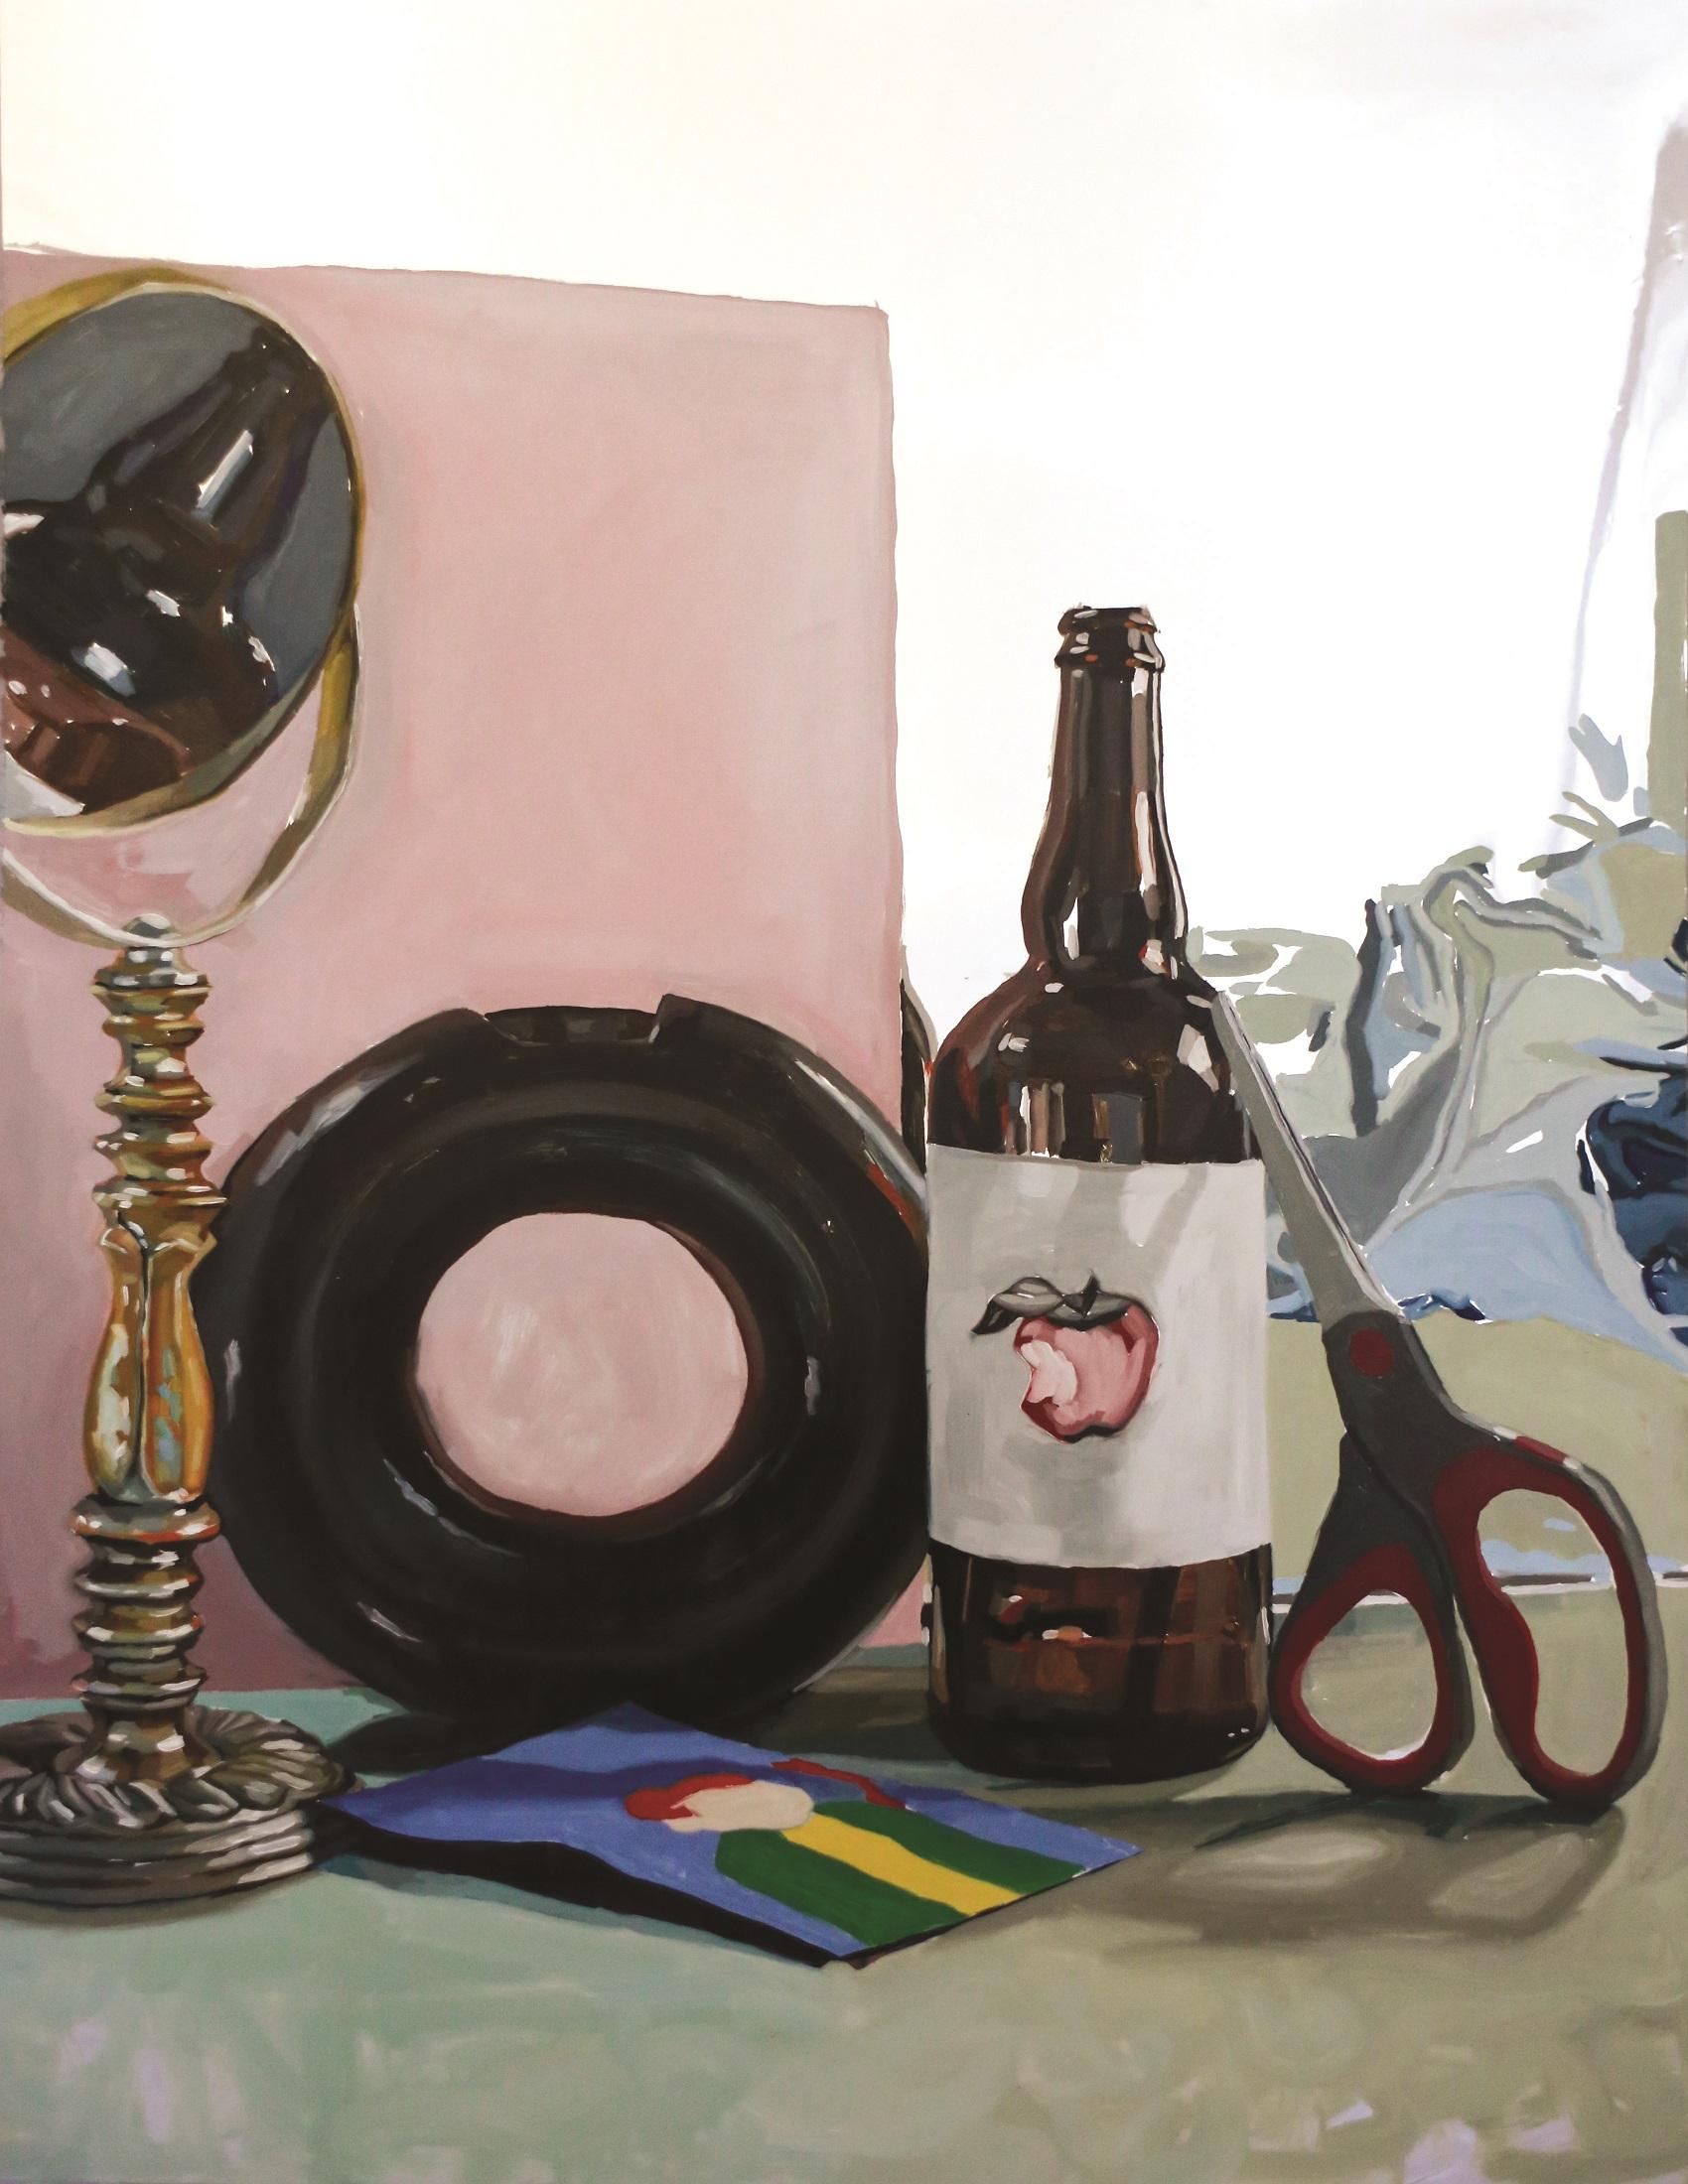 Study of Objects Ft. Joan Cornella #1